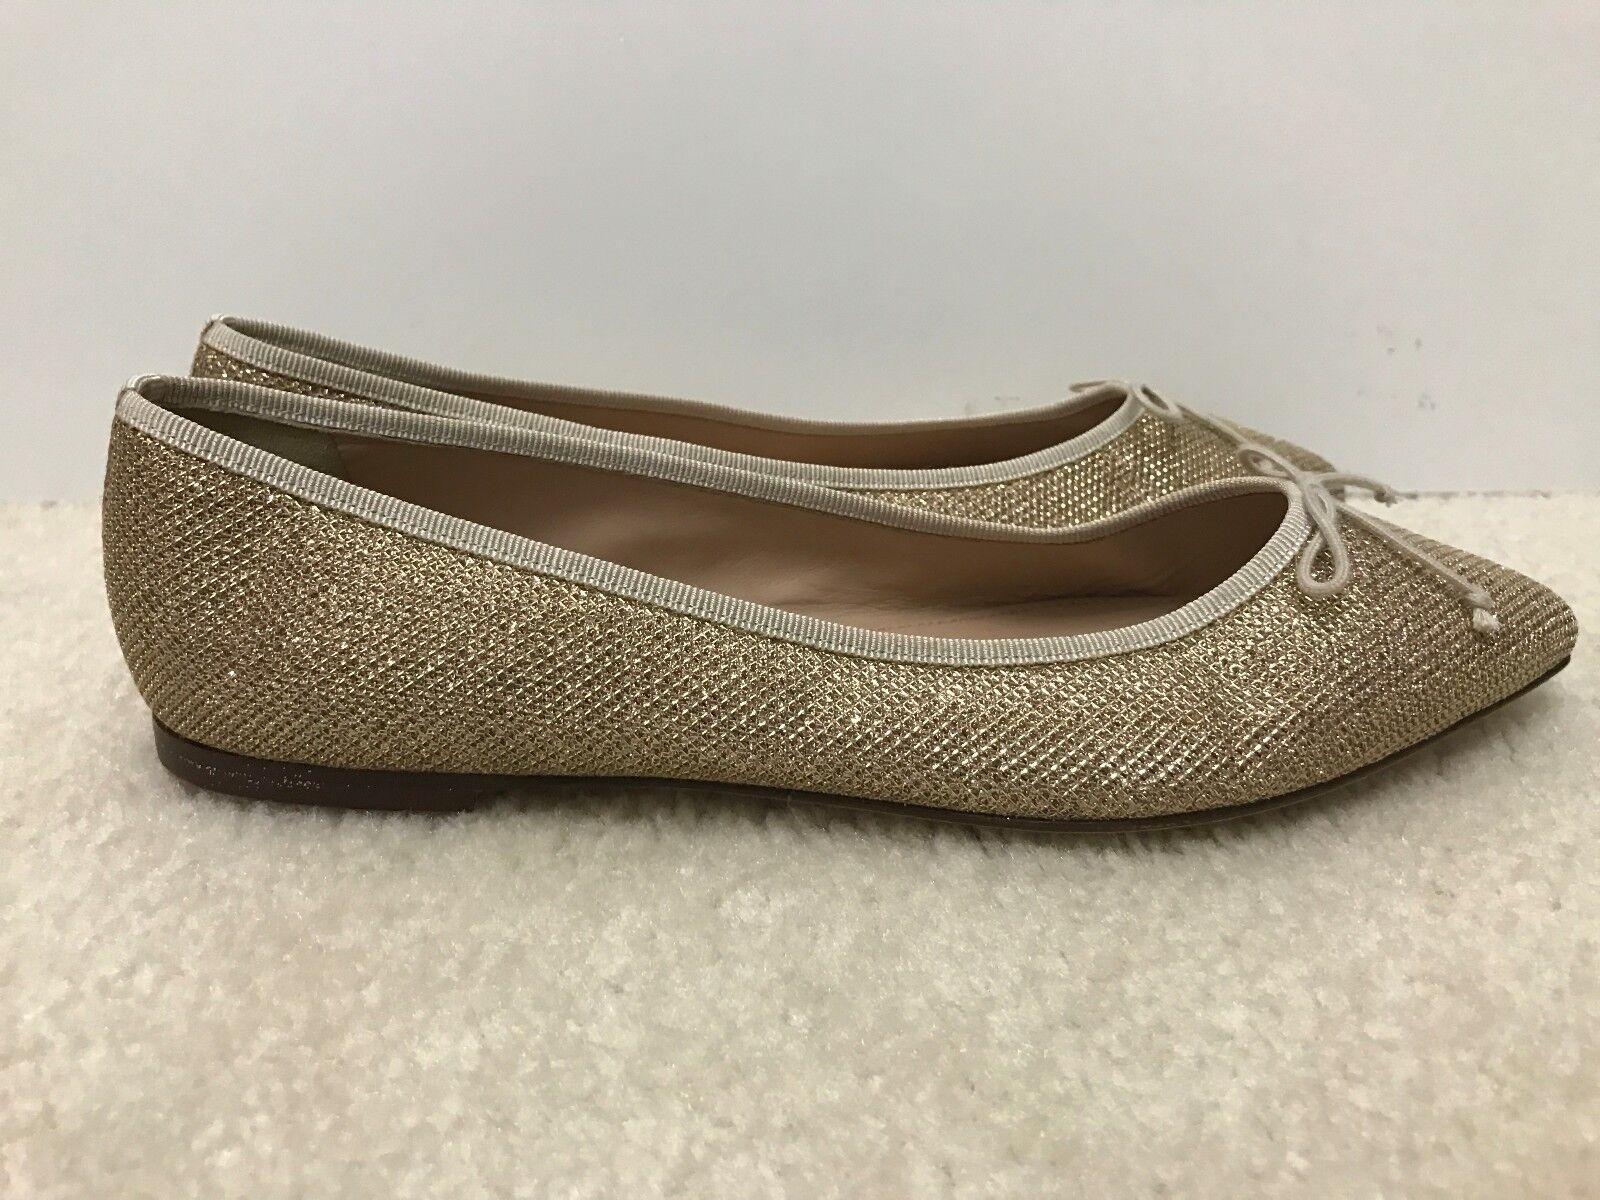 New Women J.Crew Gemma Glitter Flats, Metallic gold Sand, Size 8.5